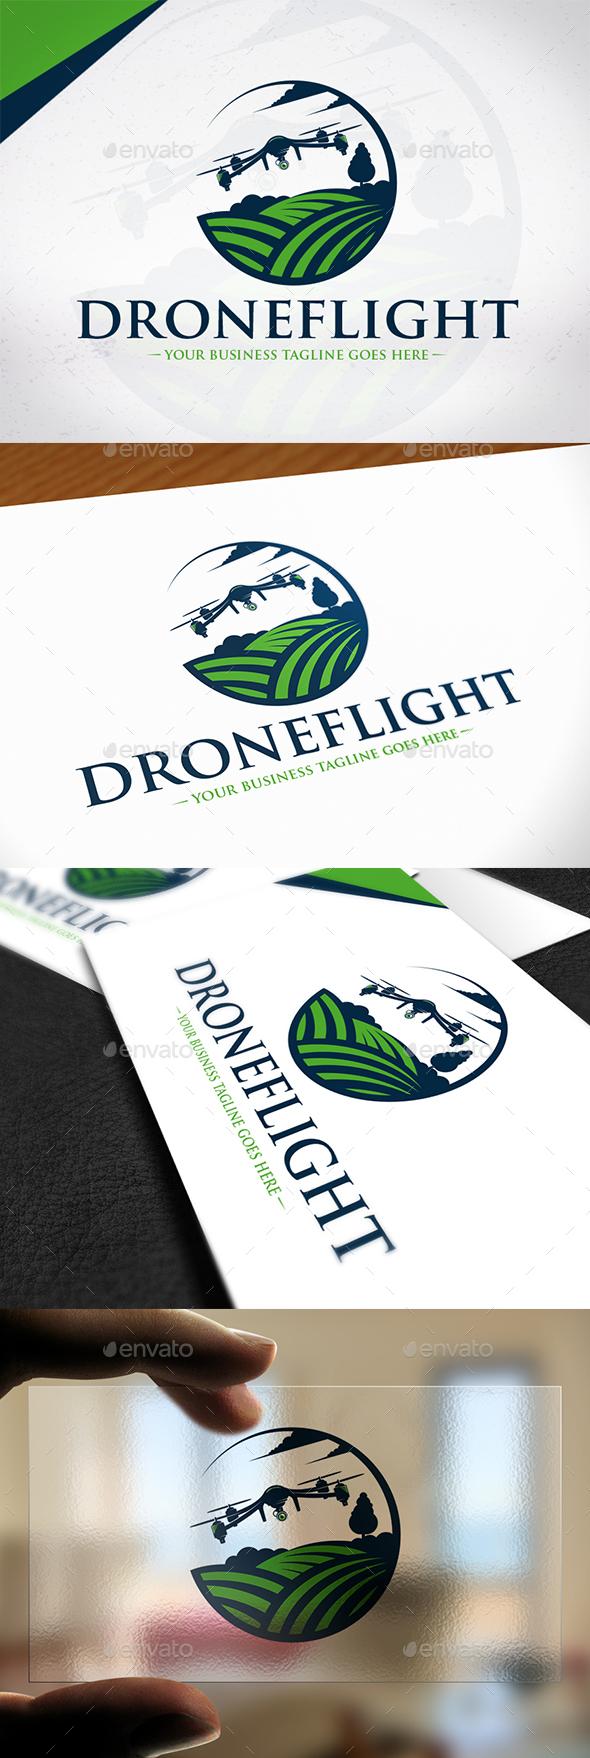 Drone Flight Logo Template - Objects Logo Templates